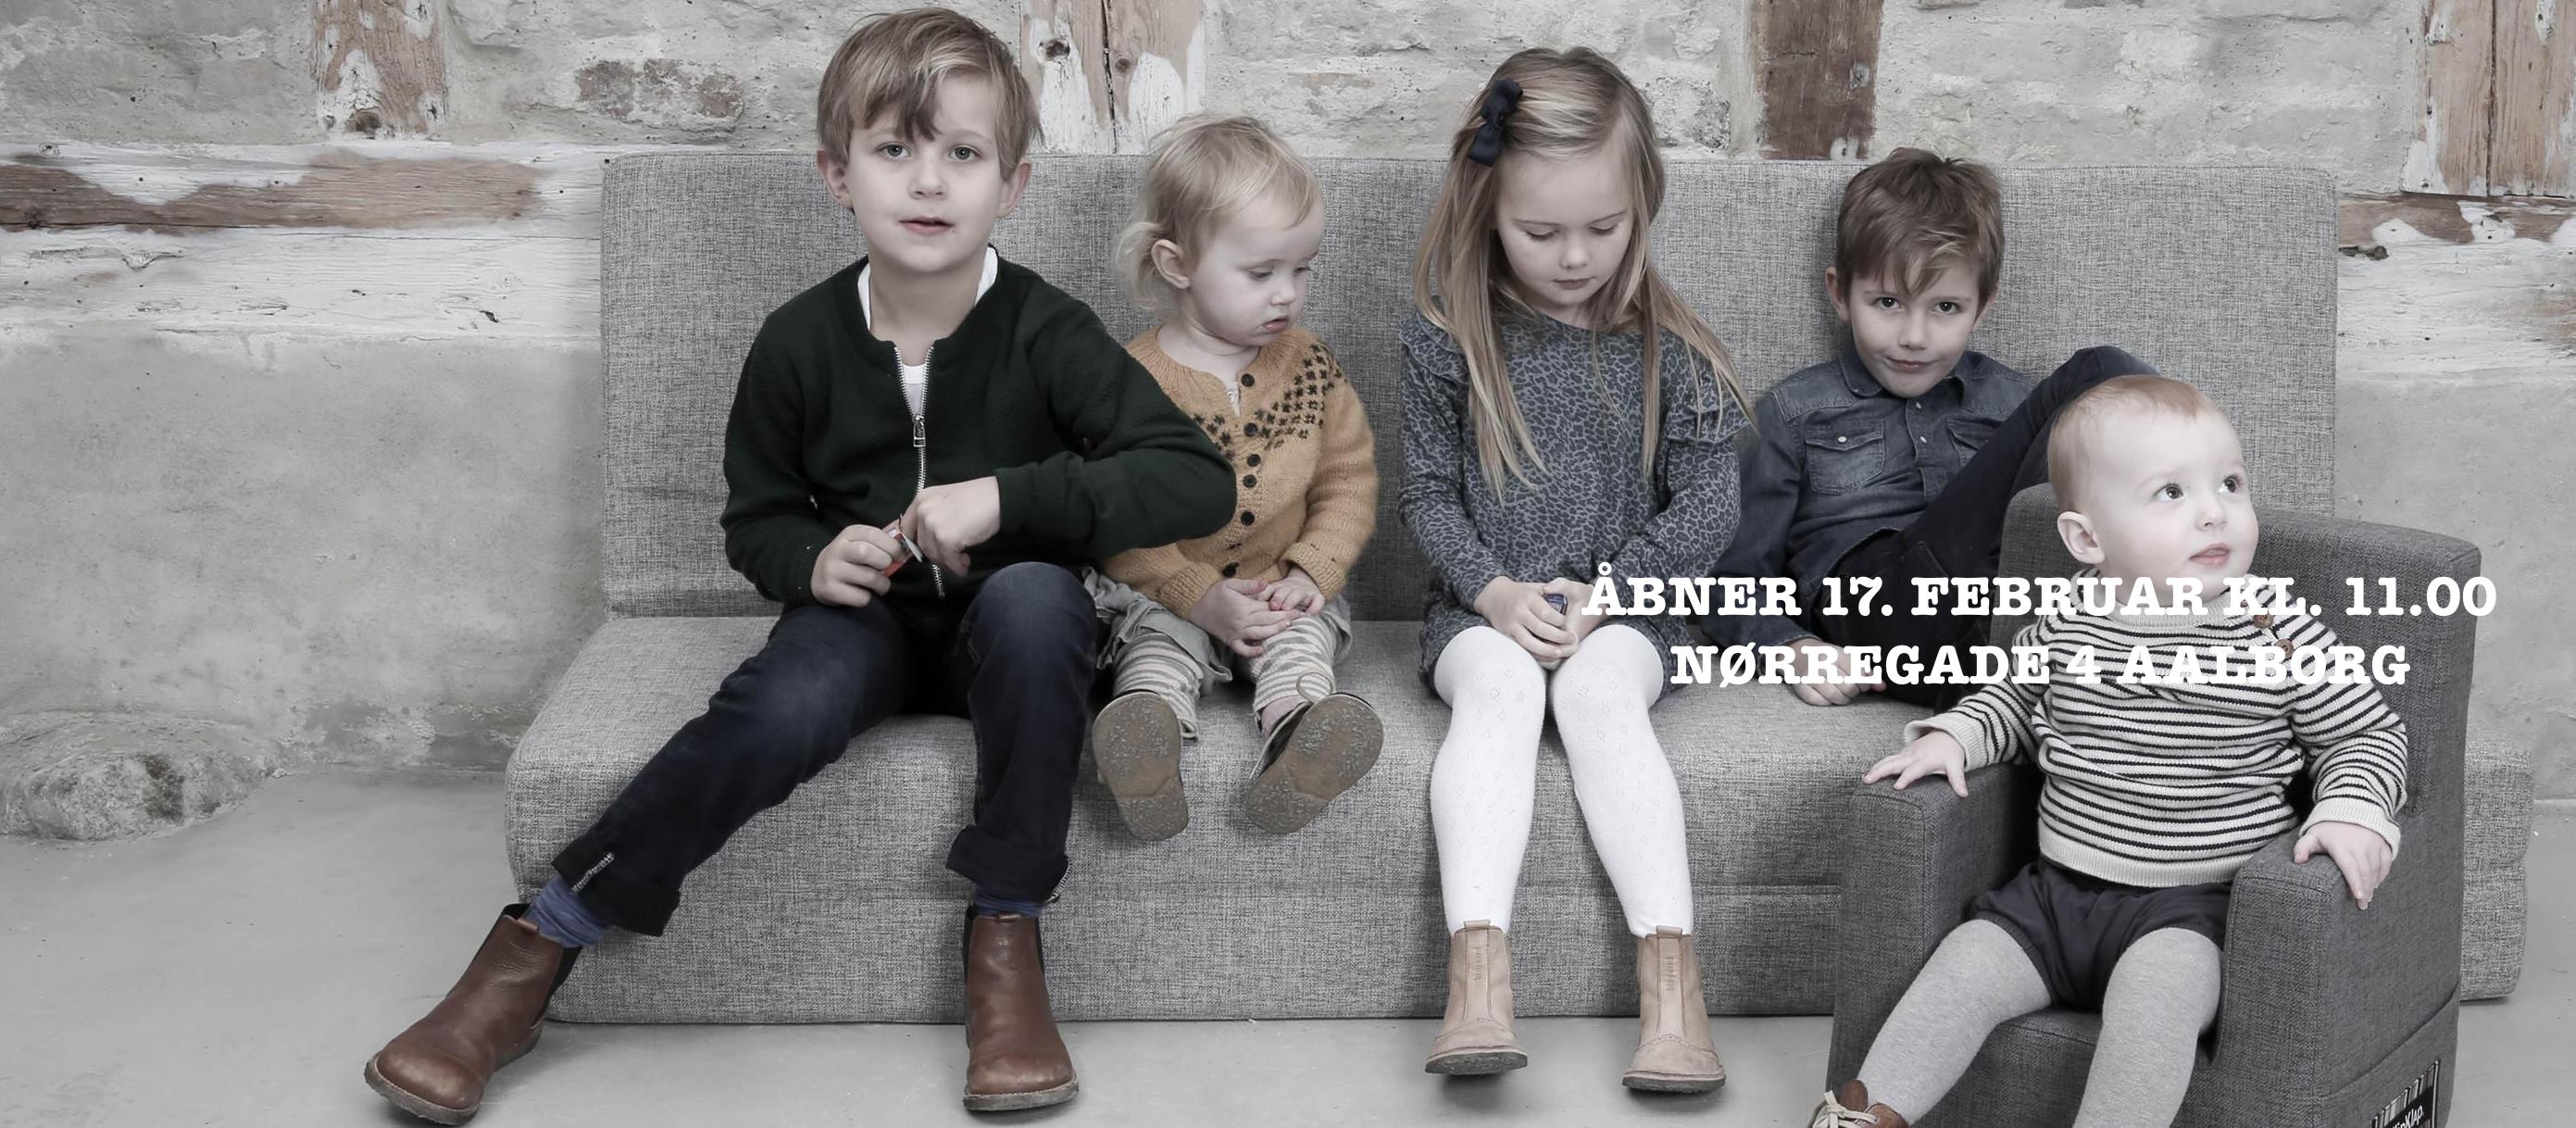 Ny børnetøjsbutik i Aalborg SKRUUK.DK